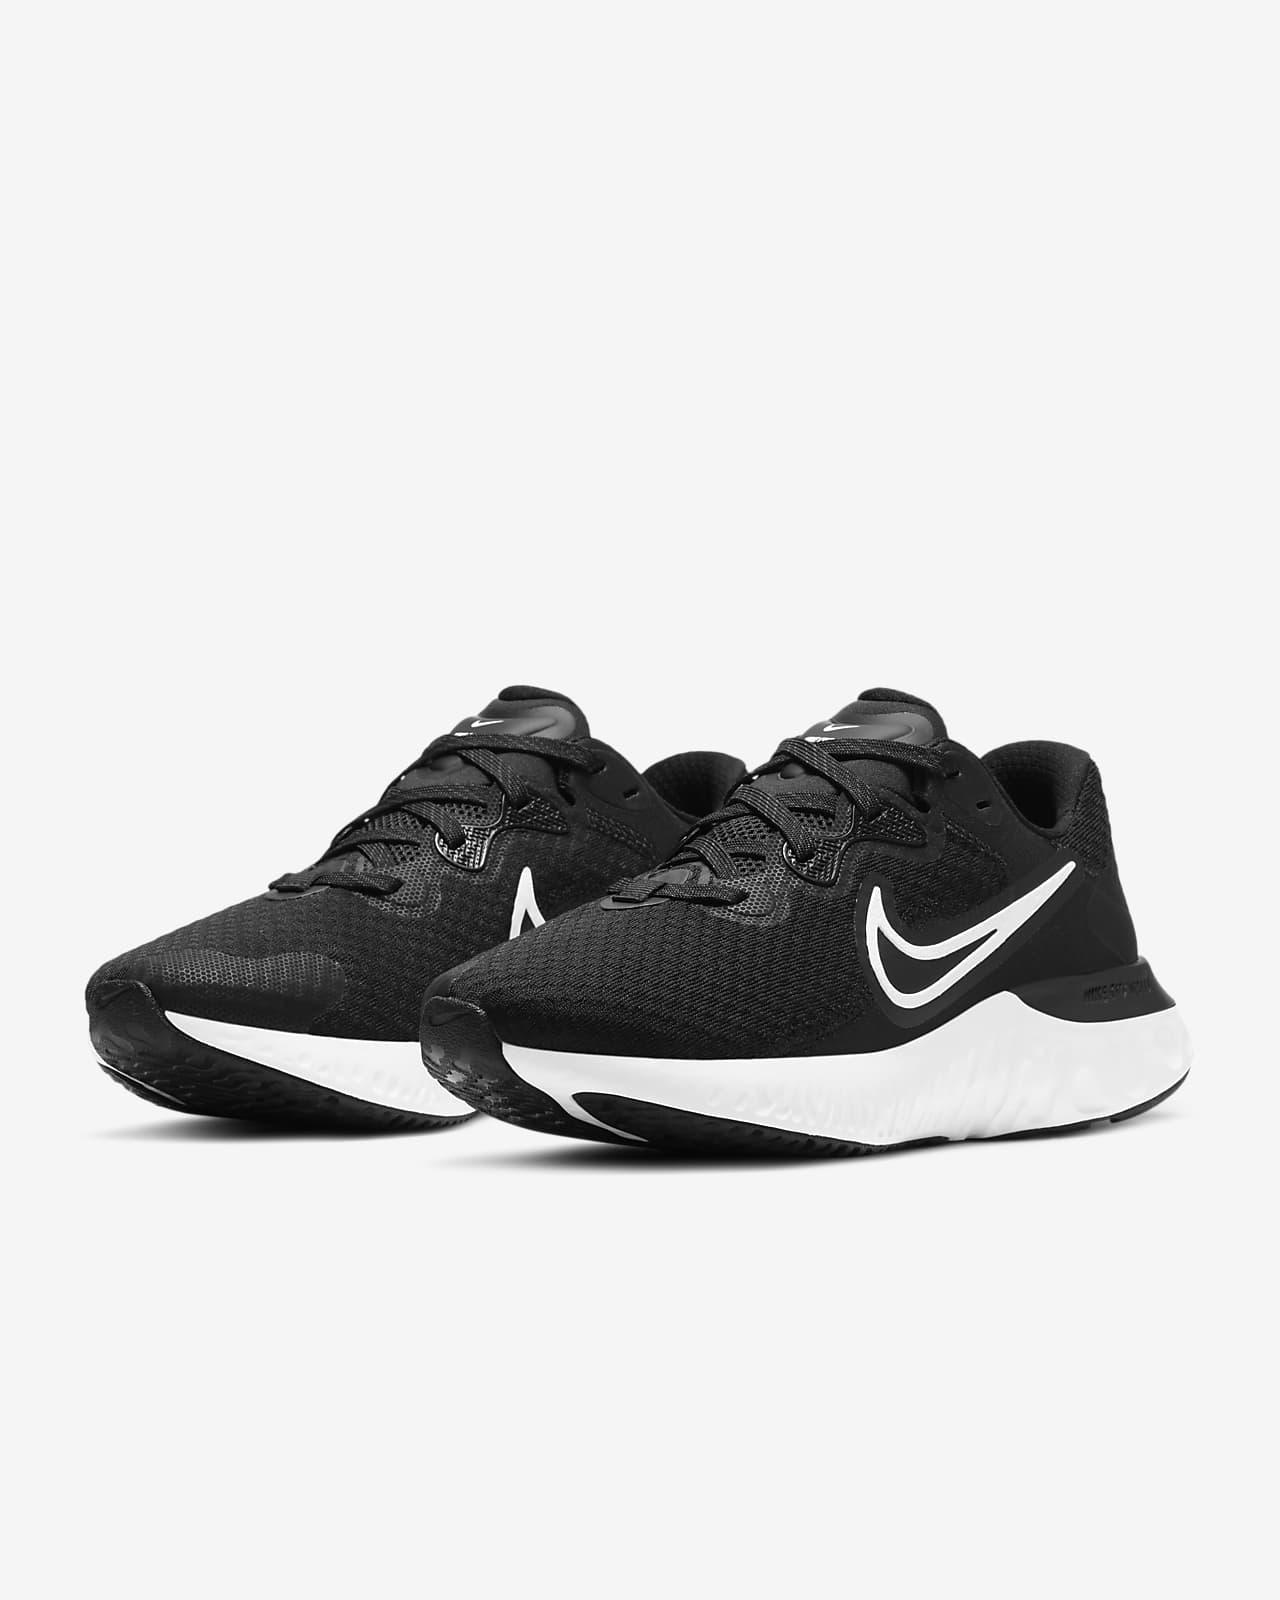 Chaussure de running Nike Renew Run 2 pour Femme. Nike CA